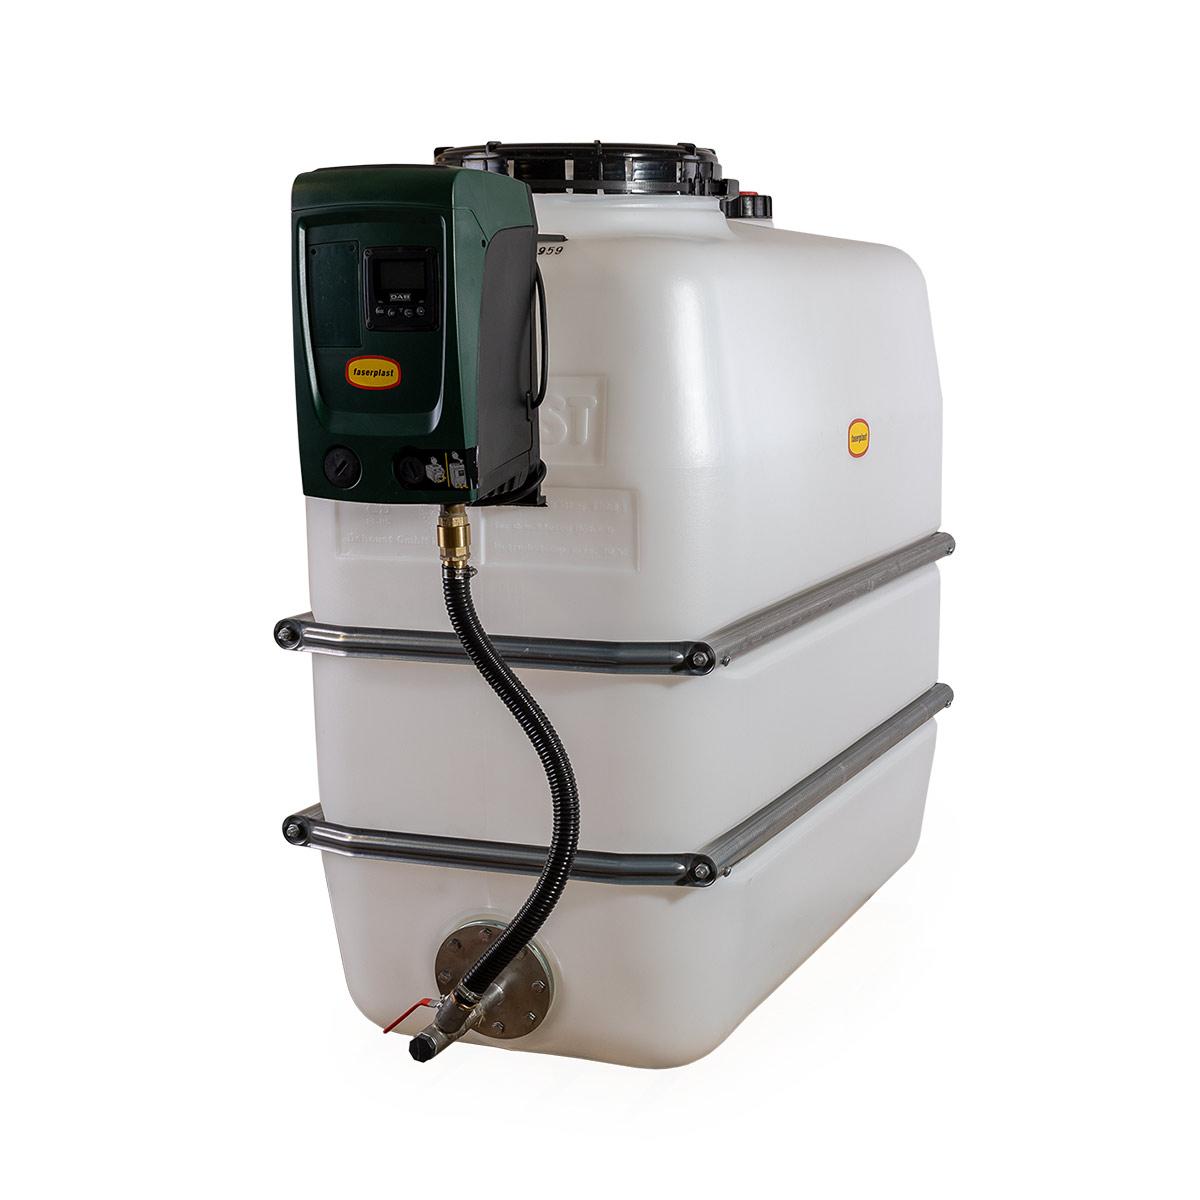 Hauswasseranlage HaWa 690